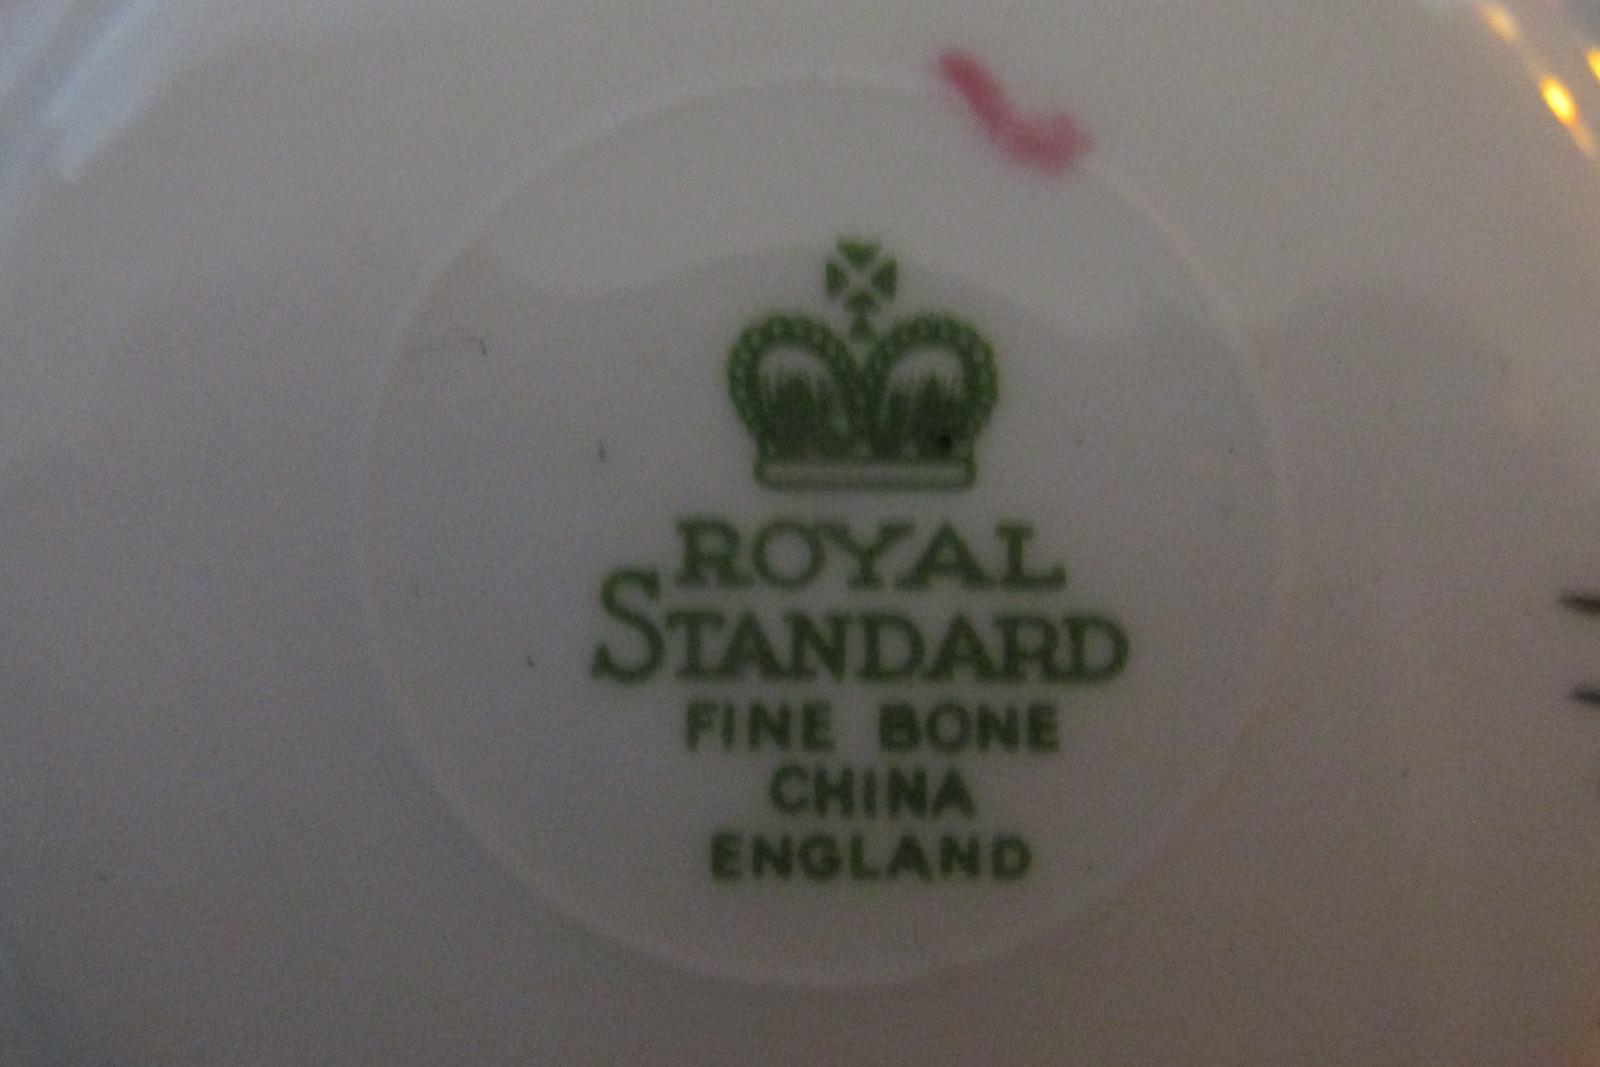 Vintage Paisley Chintz Cup & Saucer - Royal Standard English Bone China, 1950s